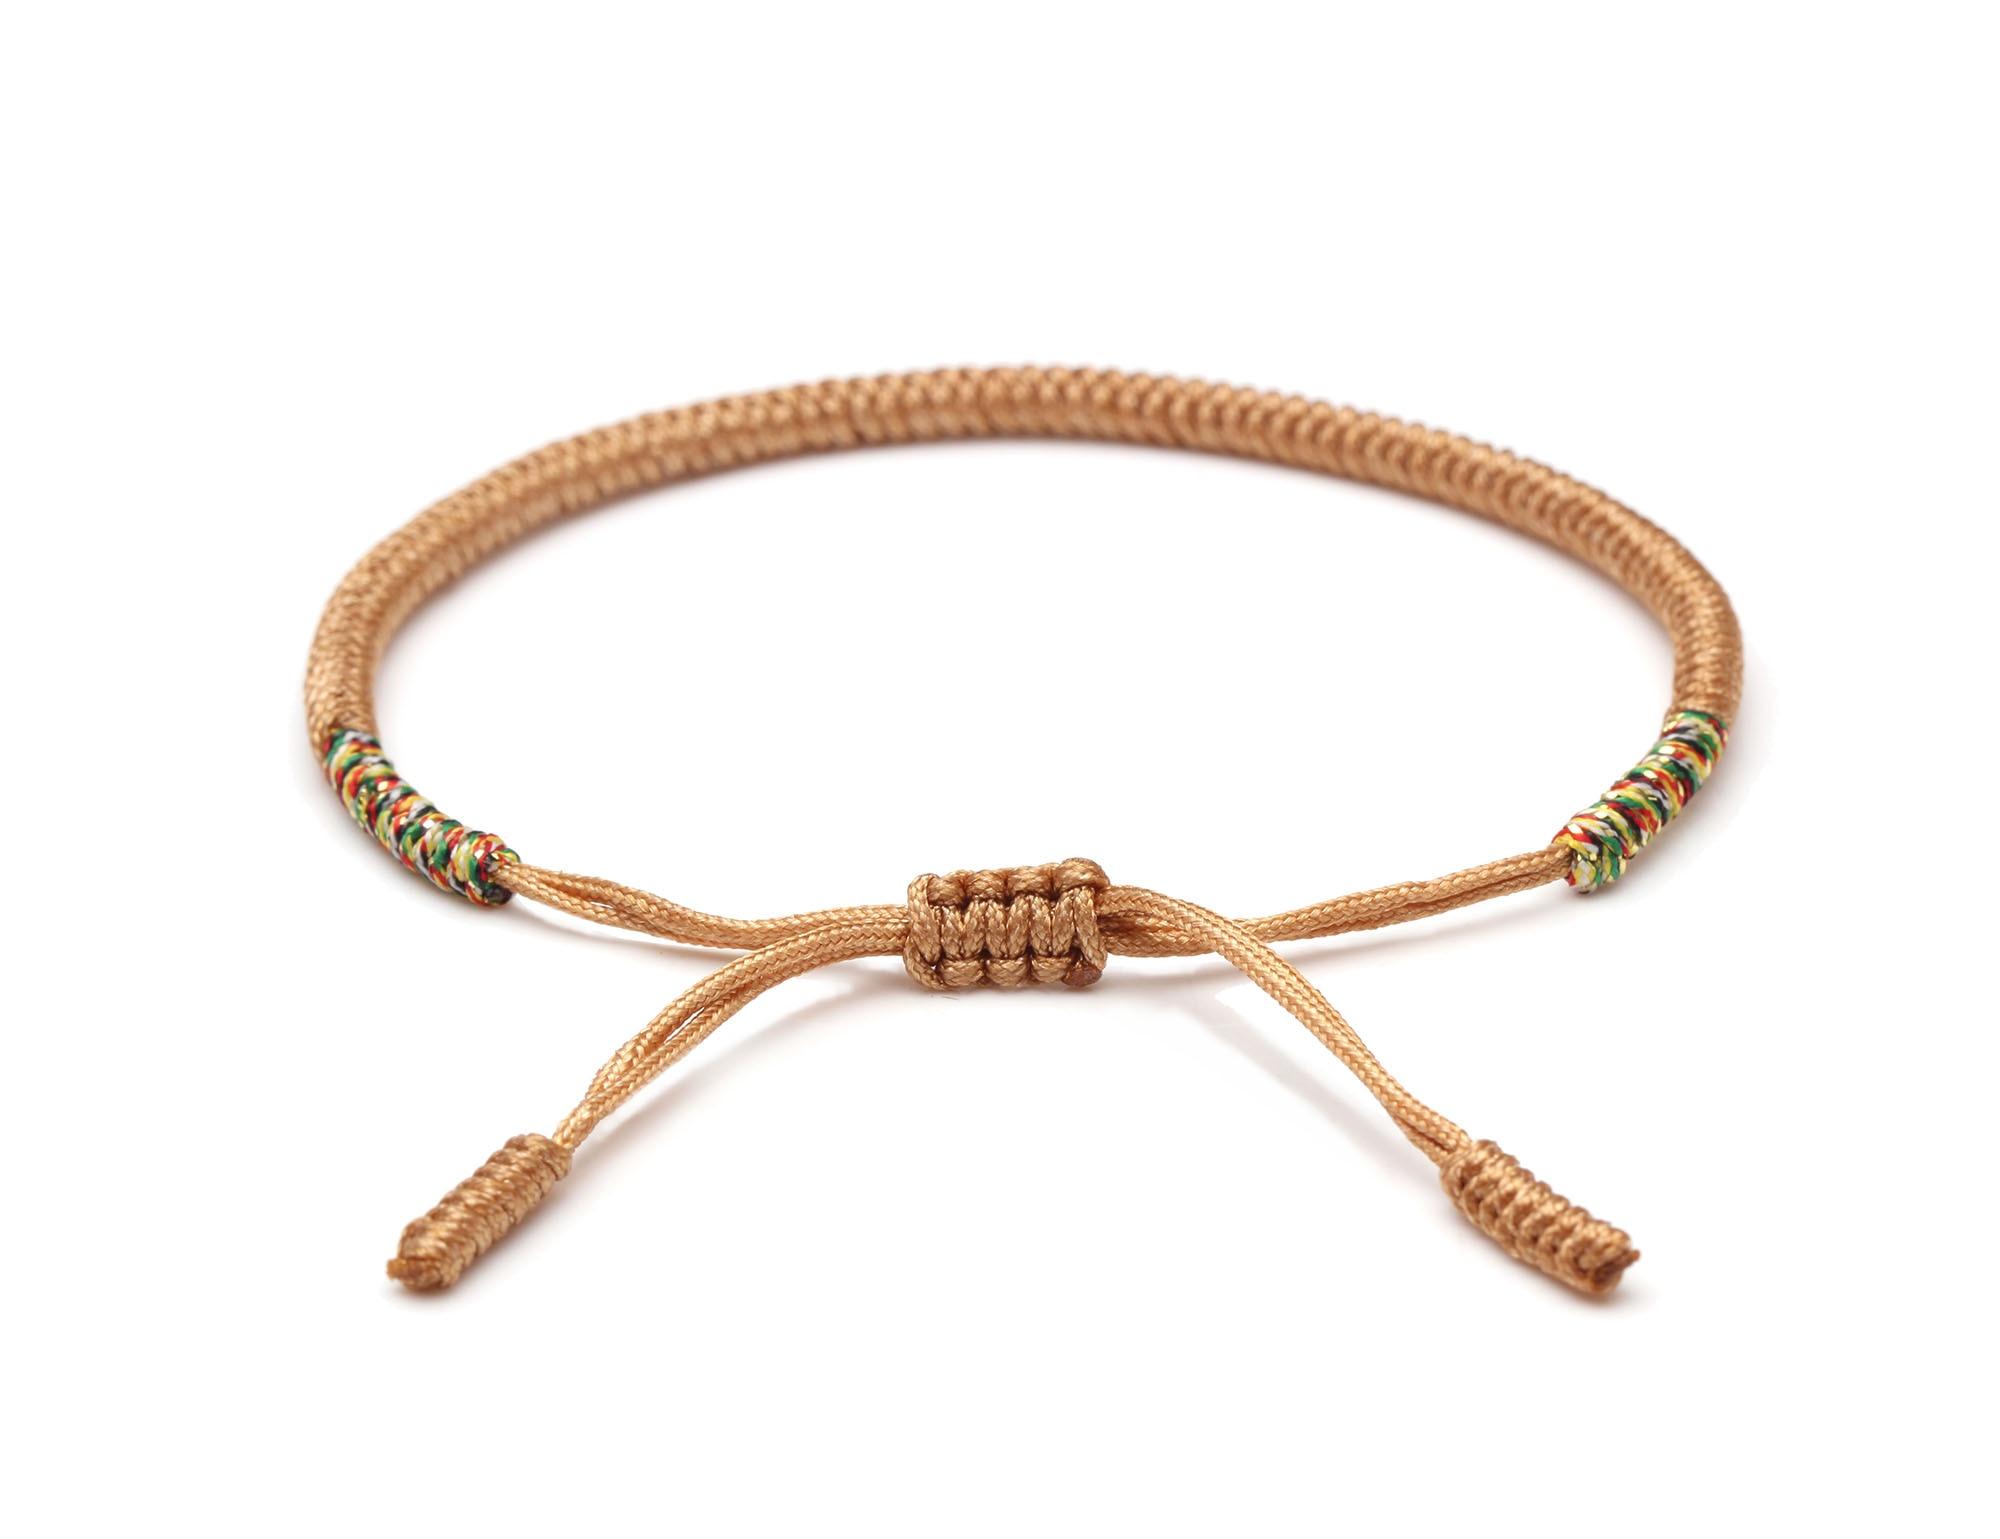 Original Tibetan Buddhist Lucky Knot Handmade Bracelet Women Men 2019 New Fashion Ethnic Colored Rope Handcrafted String Jewelry